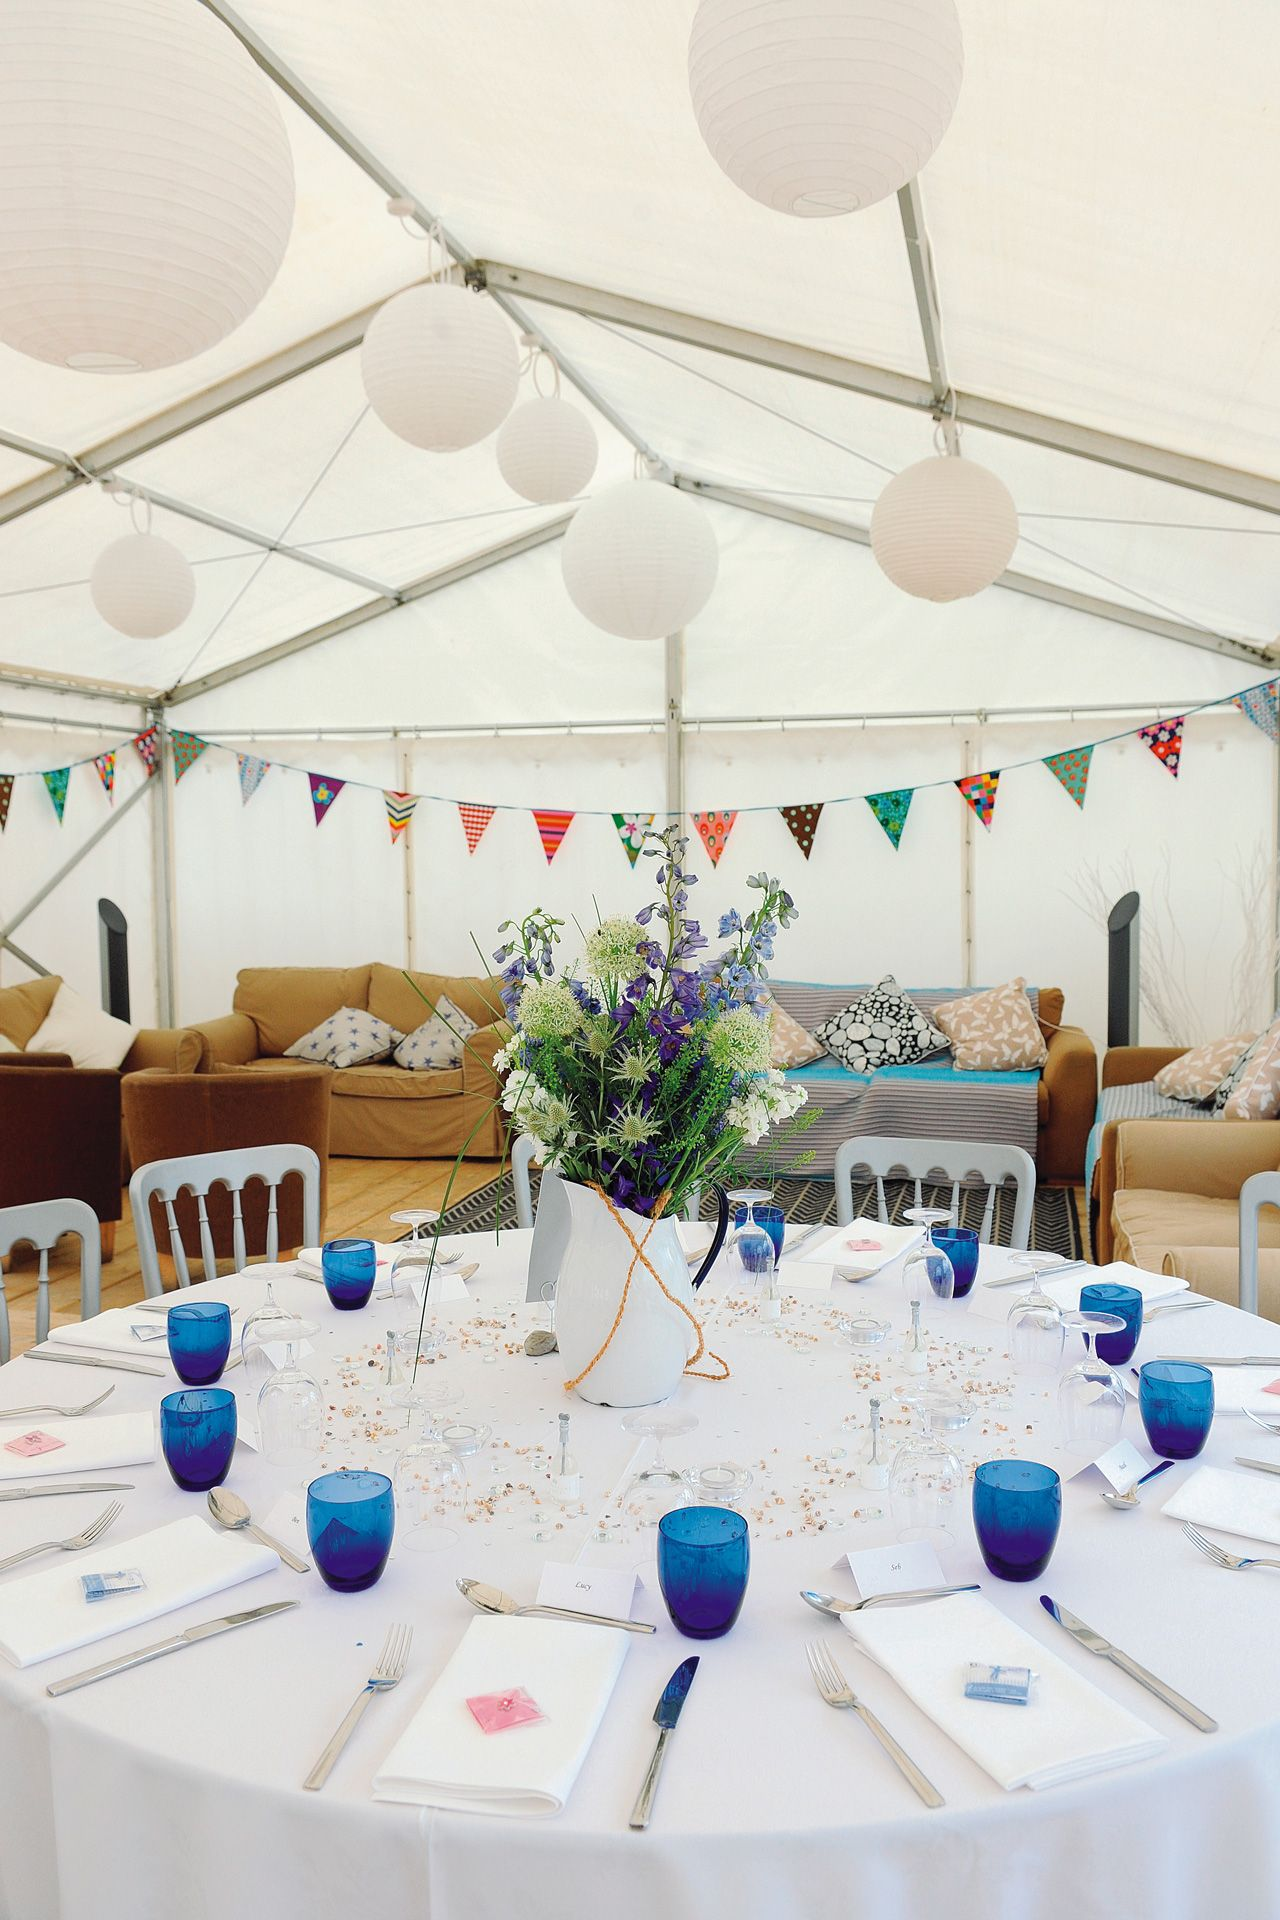 English wedding decoration ideas   Wedding Tips  If I ever get marrieduc  Pinterest  Beach